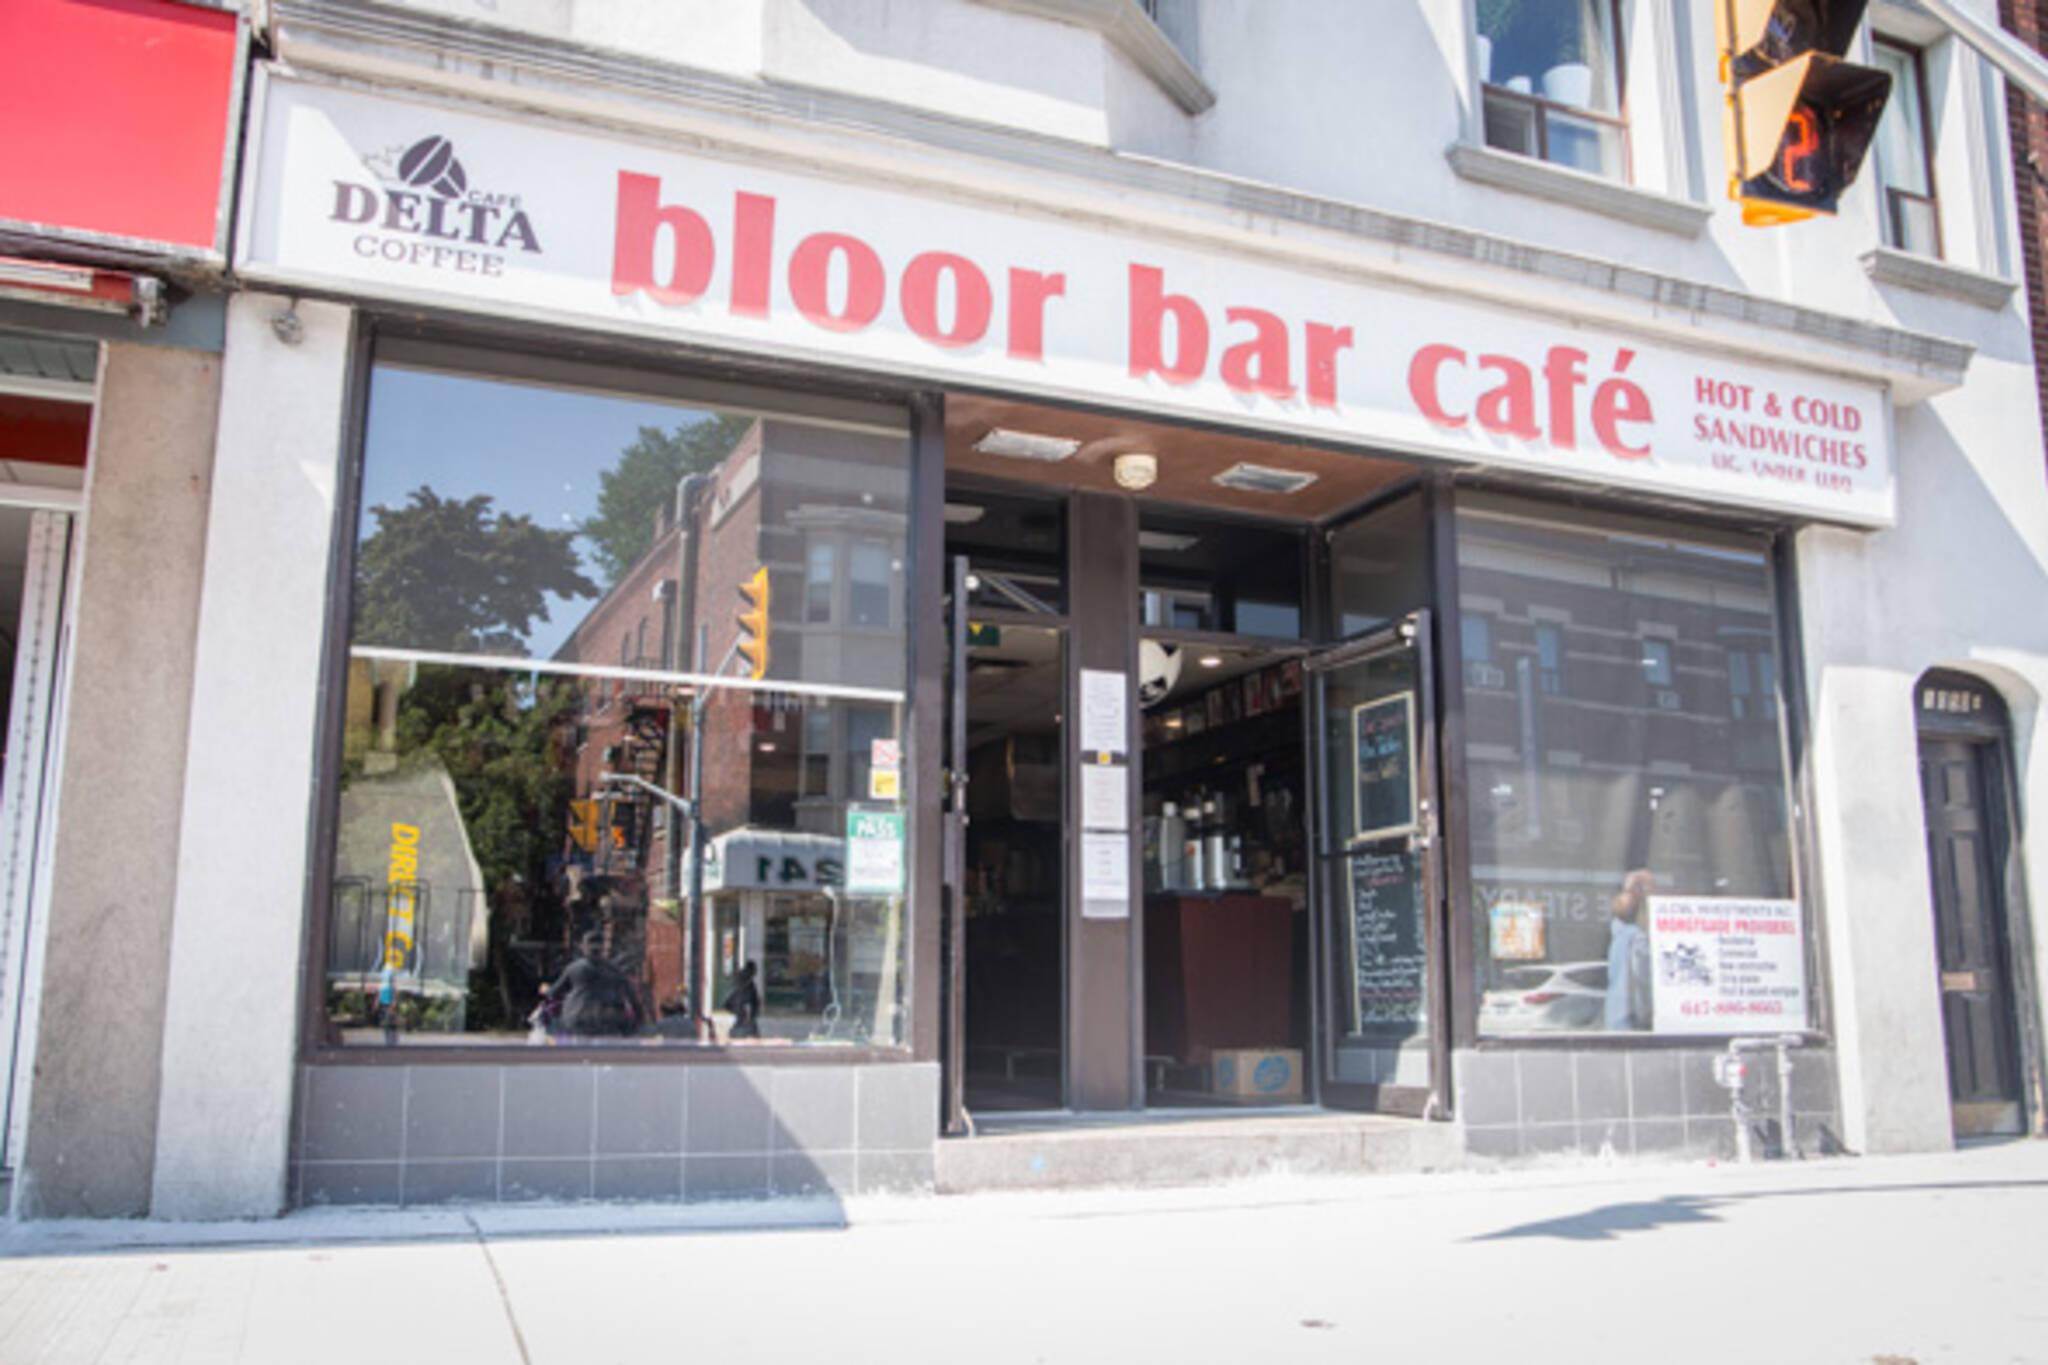 bloor bar cafe toronto